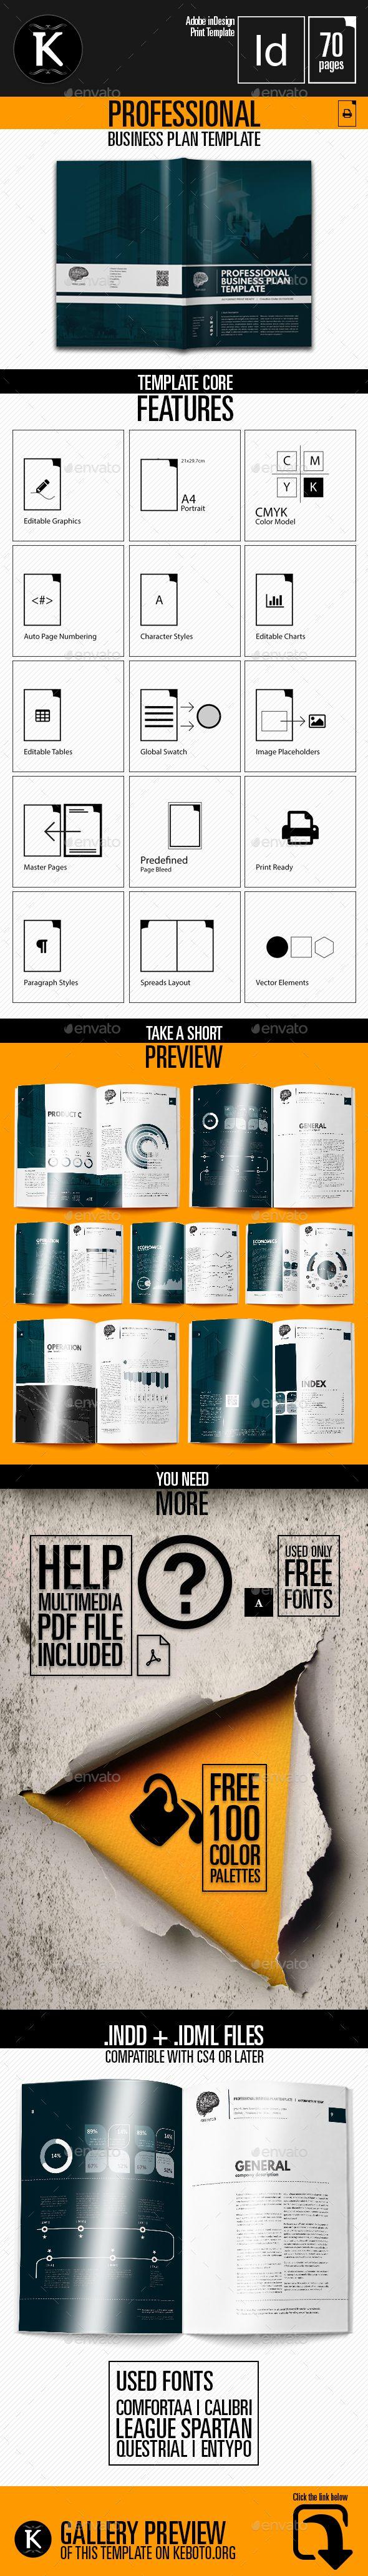 1287 best Graphic Design images on Pinterest | Adobe indesign ...